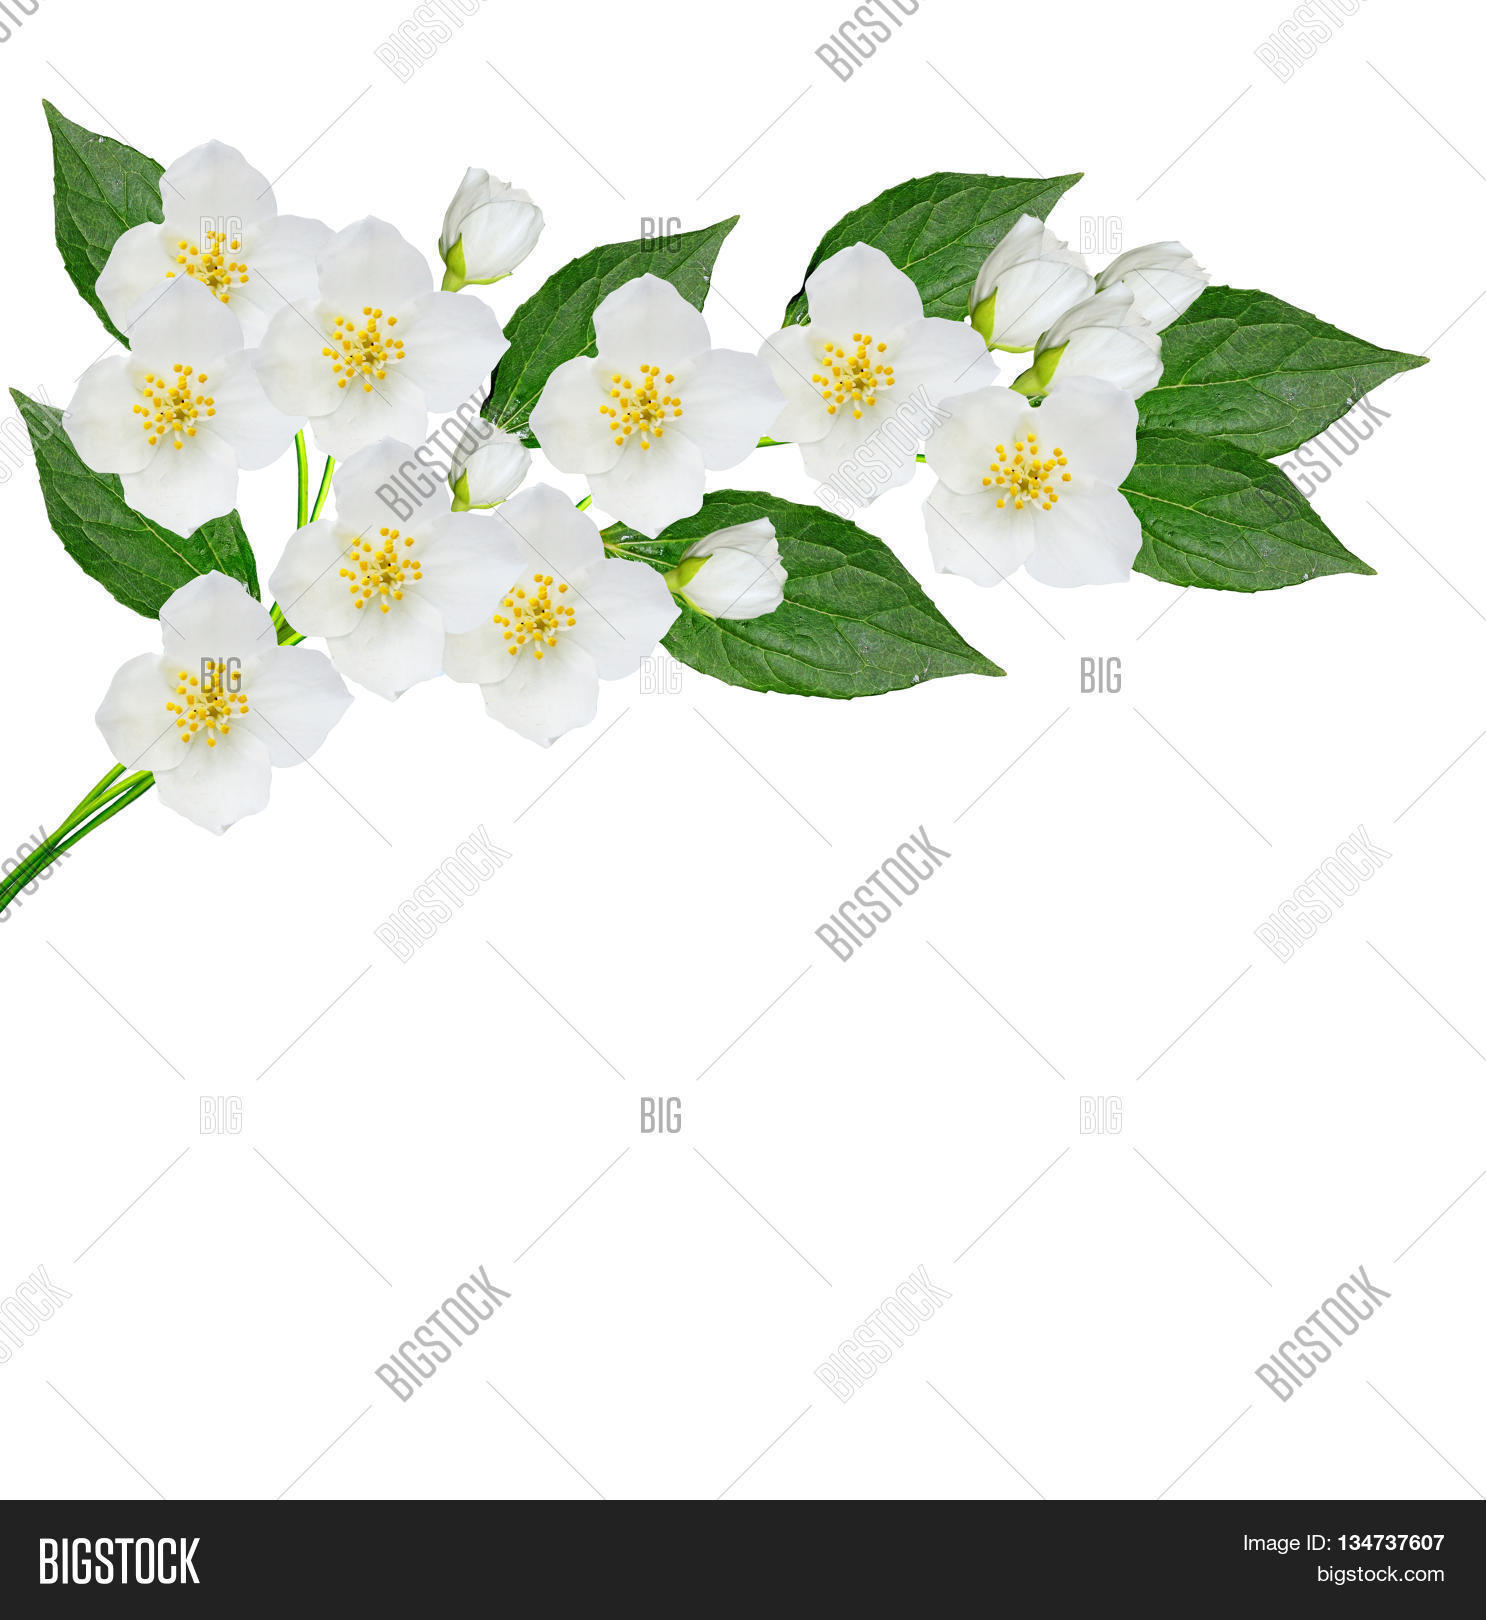 White jasmine flower image photo free trial bigstock white jasmine flower branch of jasmine flowers isolated on white background spring flowers izmirmasajfo